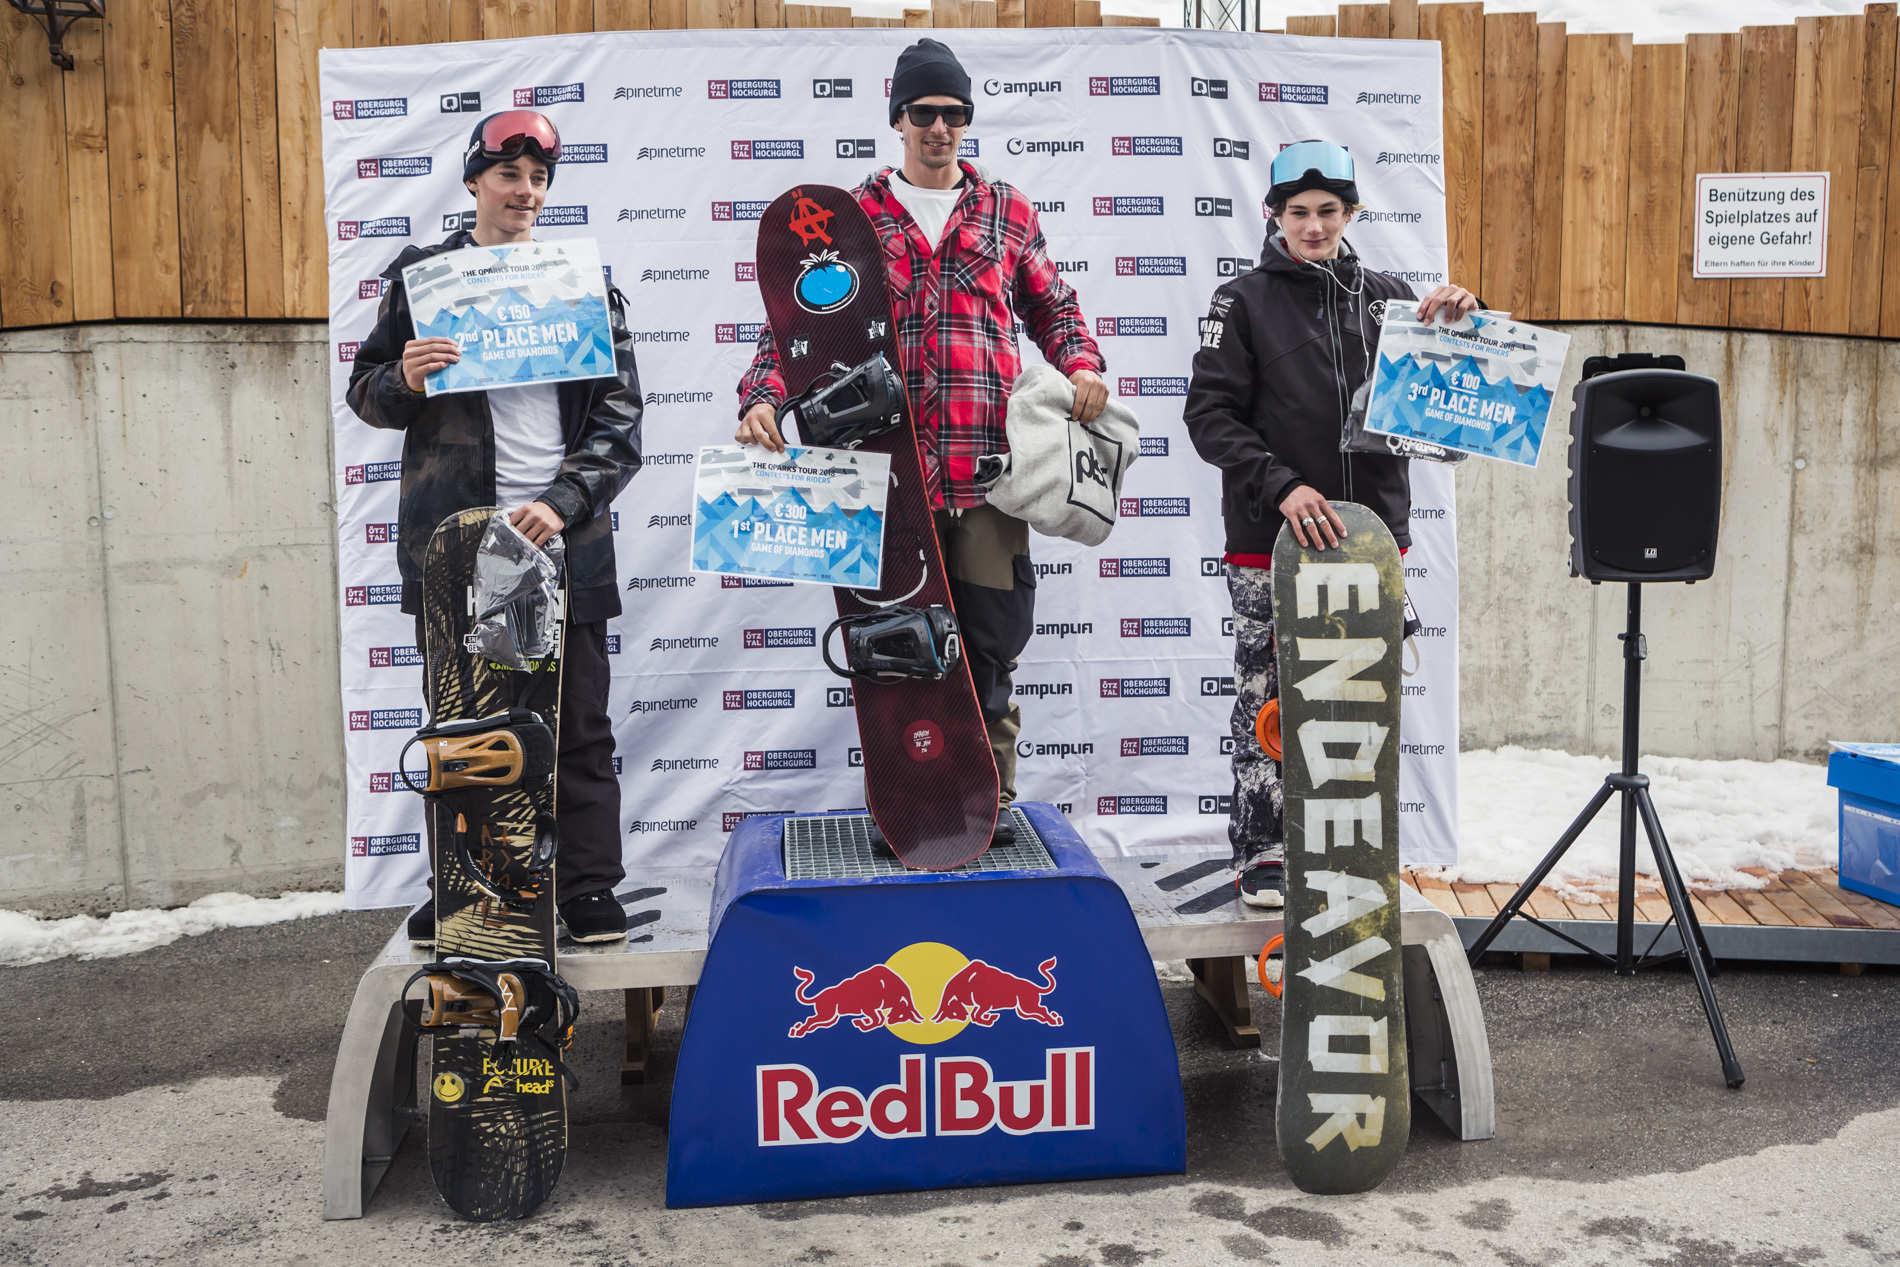 obergurgl tourfinale 15 04 2018 roland haschka qparks 016